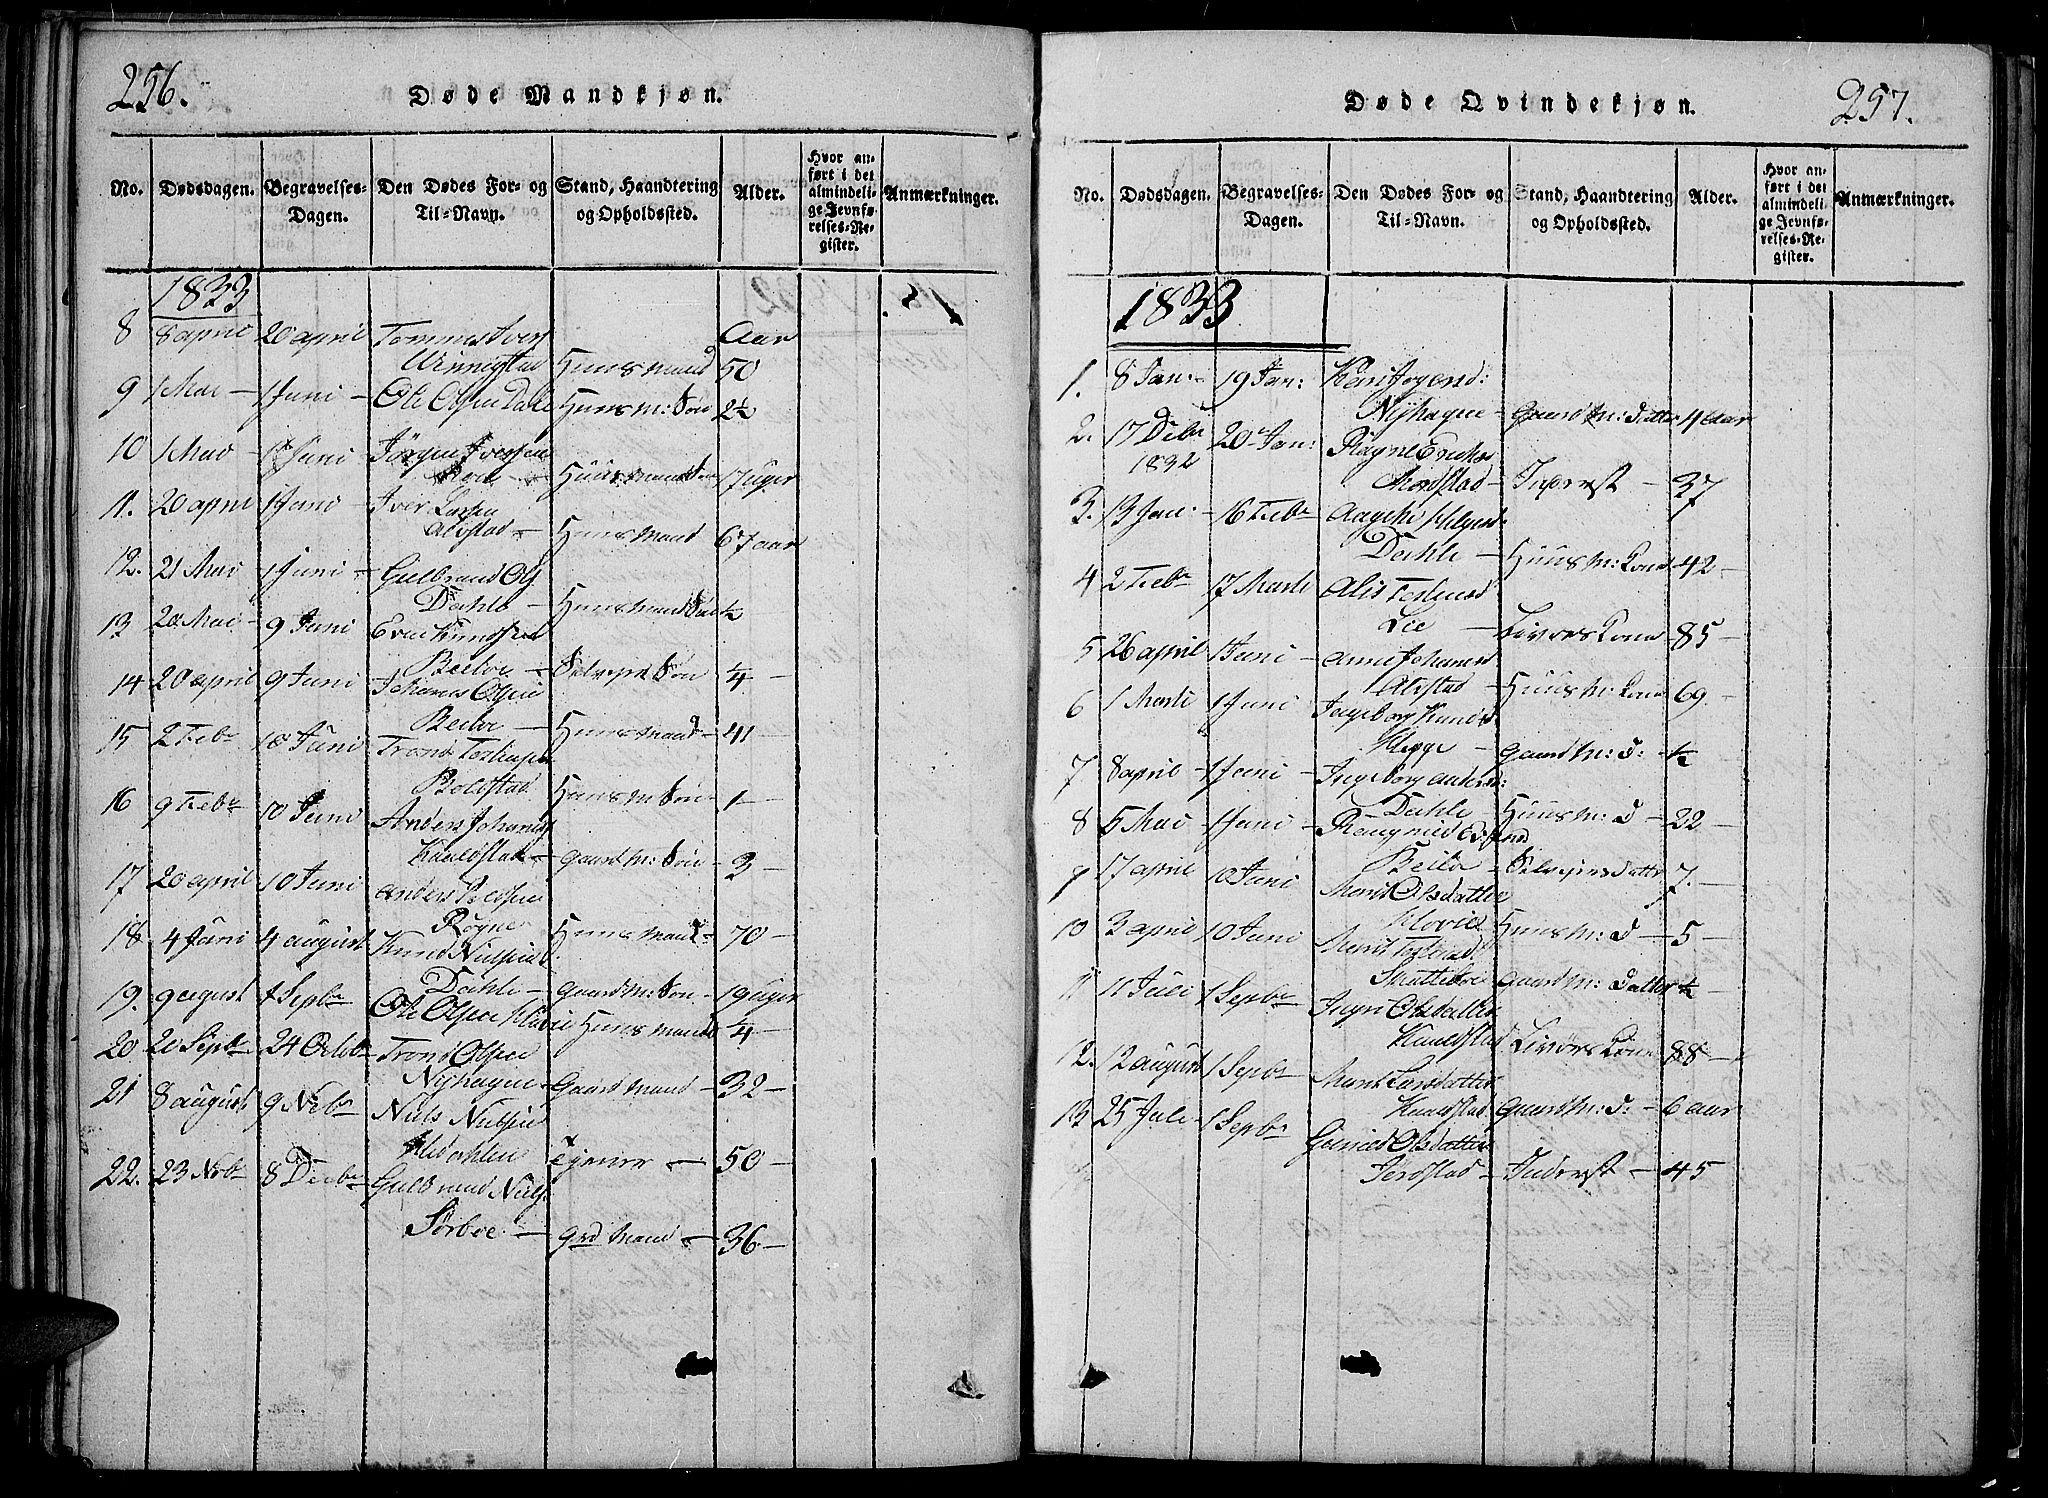 SAH, Slidre prestekontor, Klokkerbok nr. 2, 1814-1839, s. 256-257